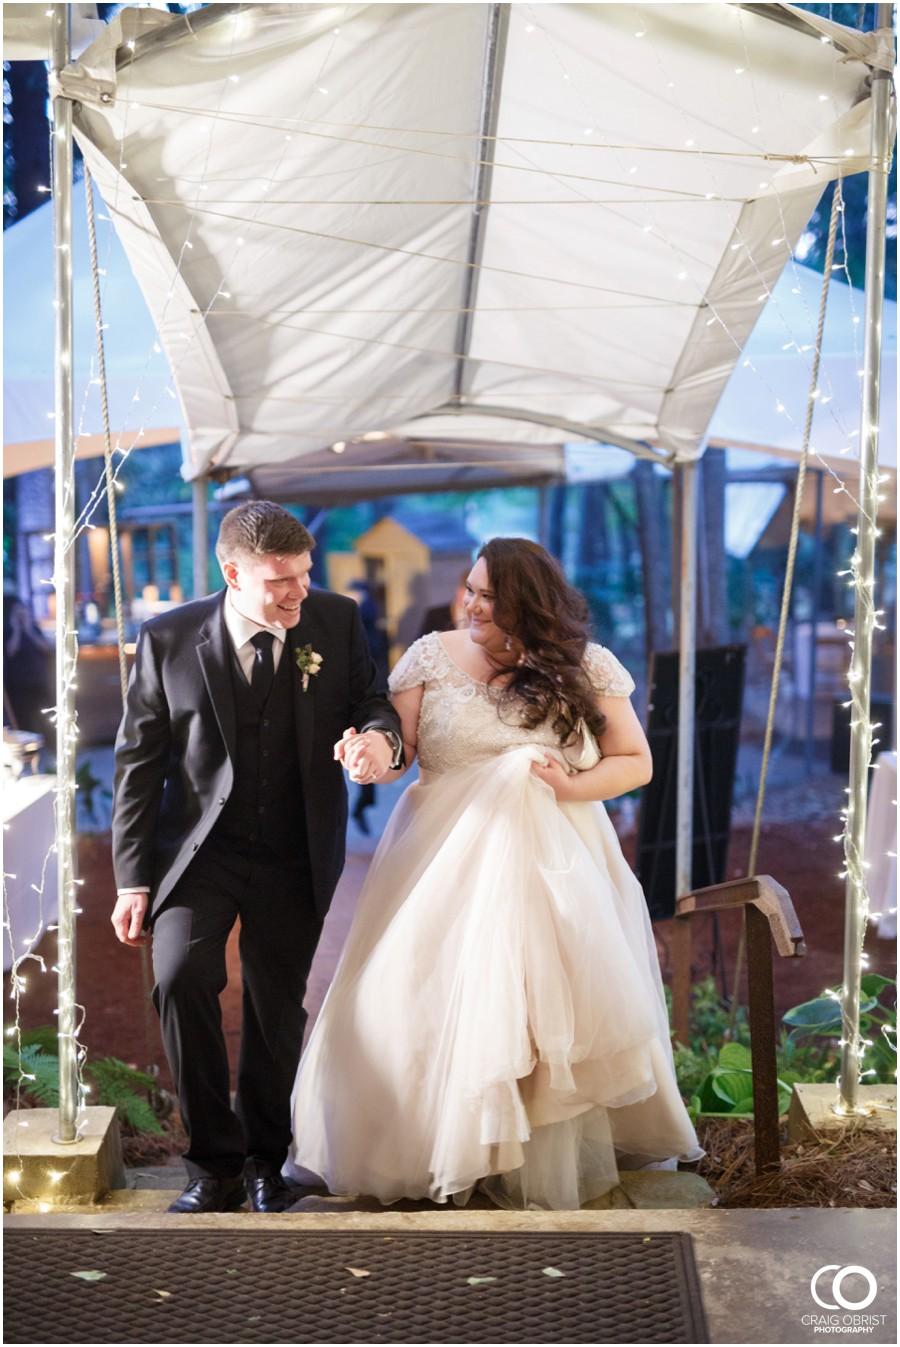 Dunaway gardens Wedding Fairytale Disney Portraits_0083.jpg